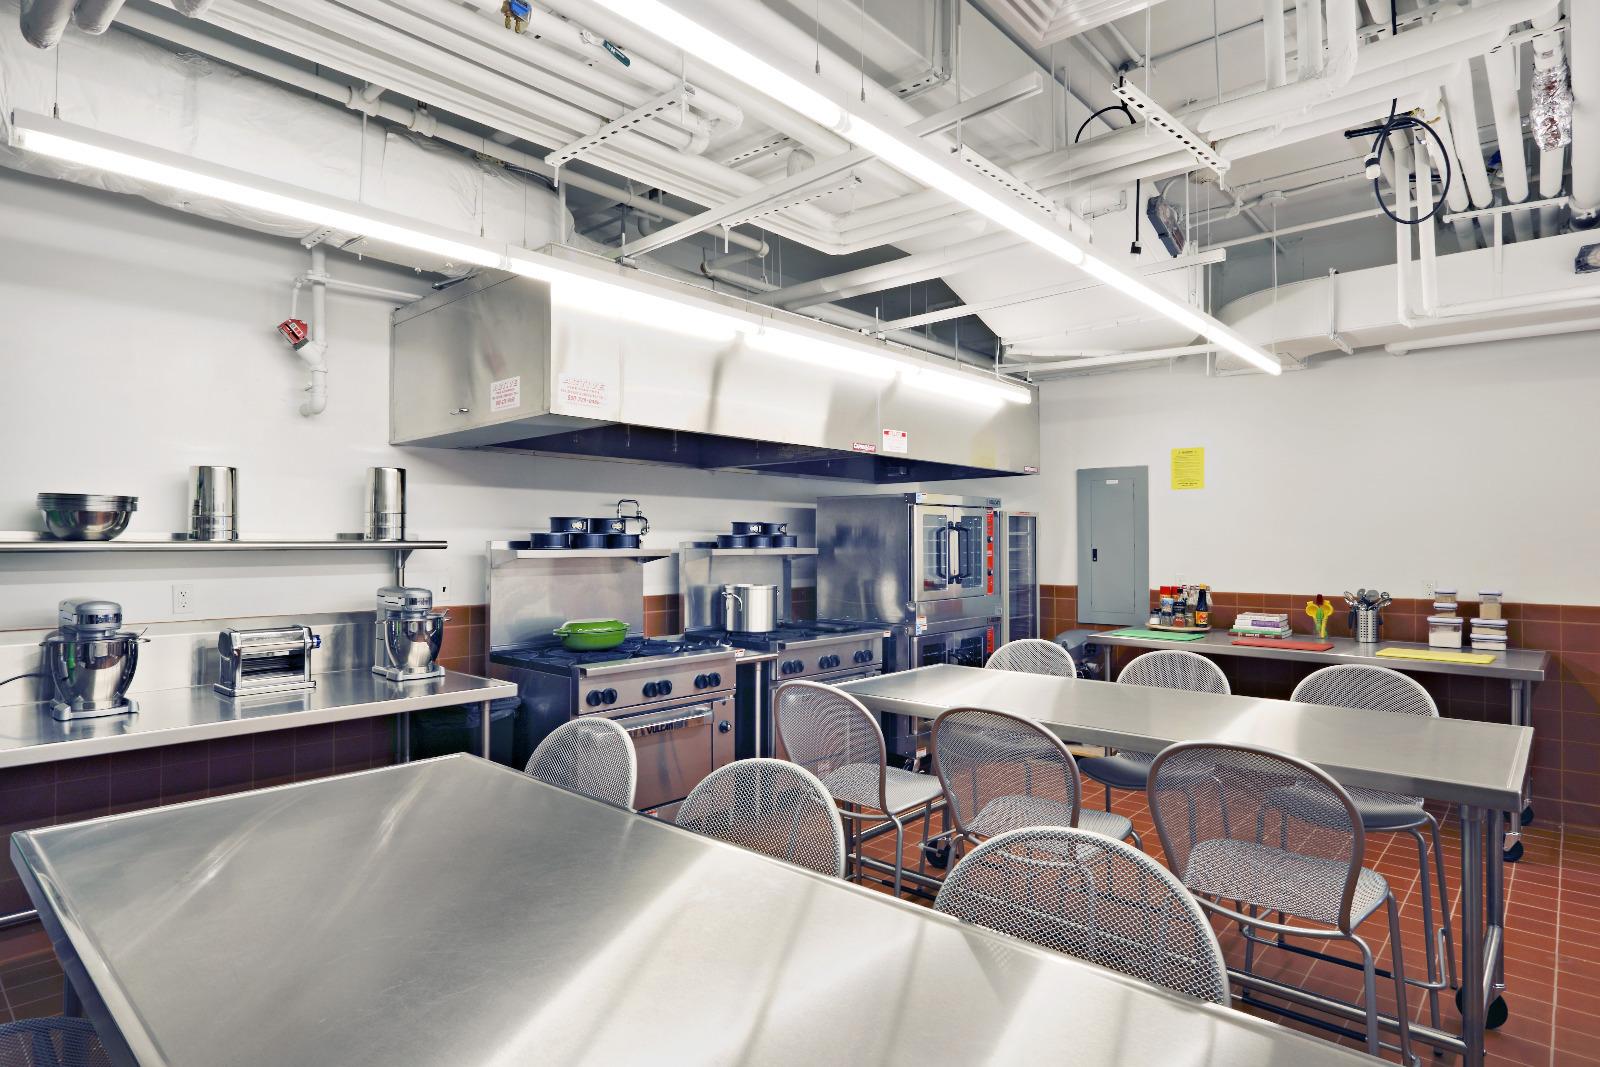 Asphalt Green Battery Park City Culinary Center